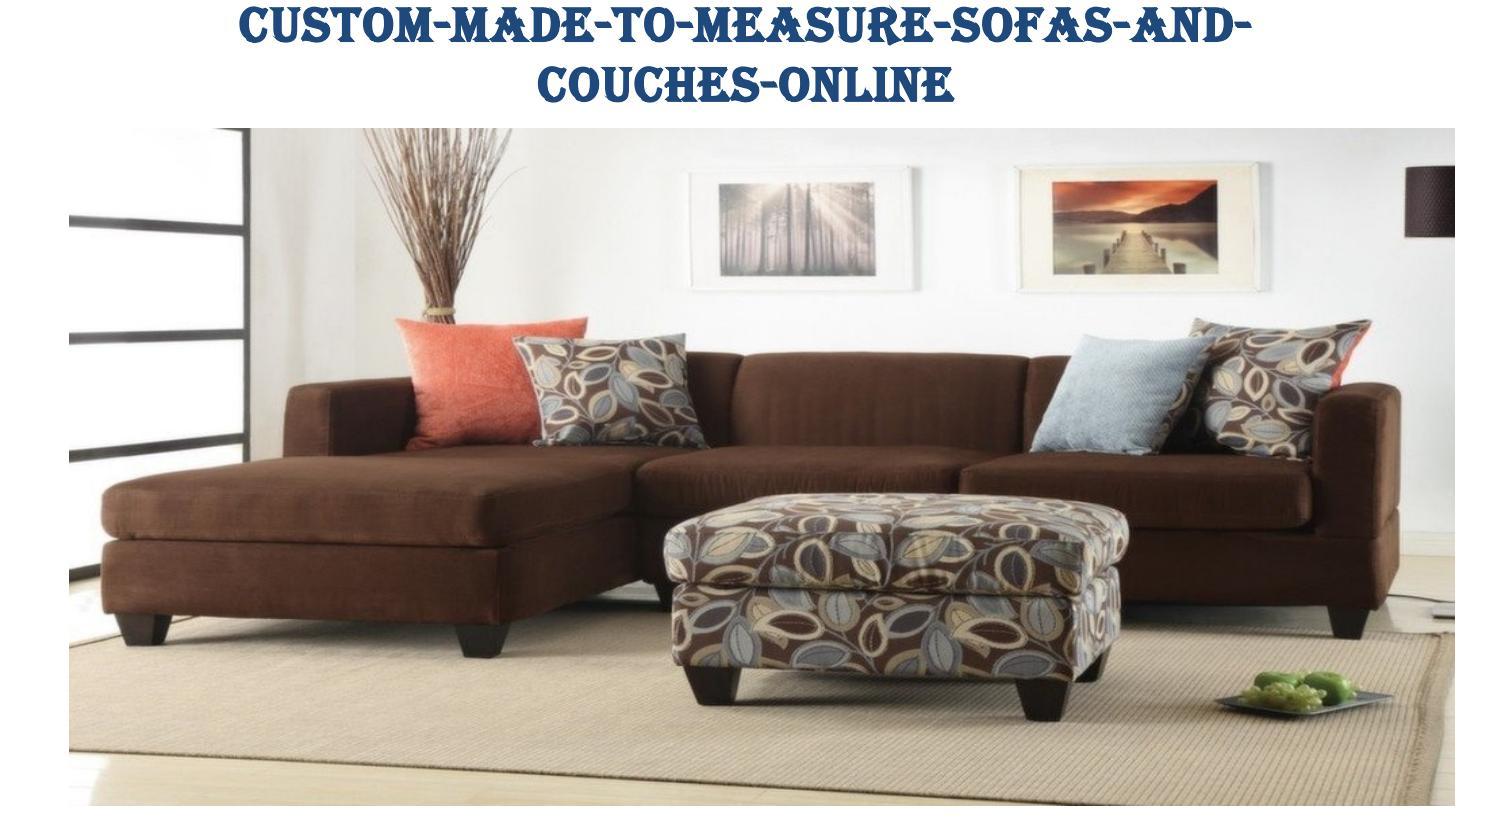 Custom Made To Measure Sofas And